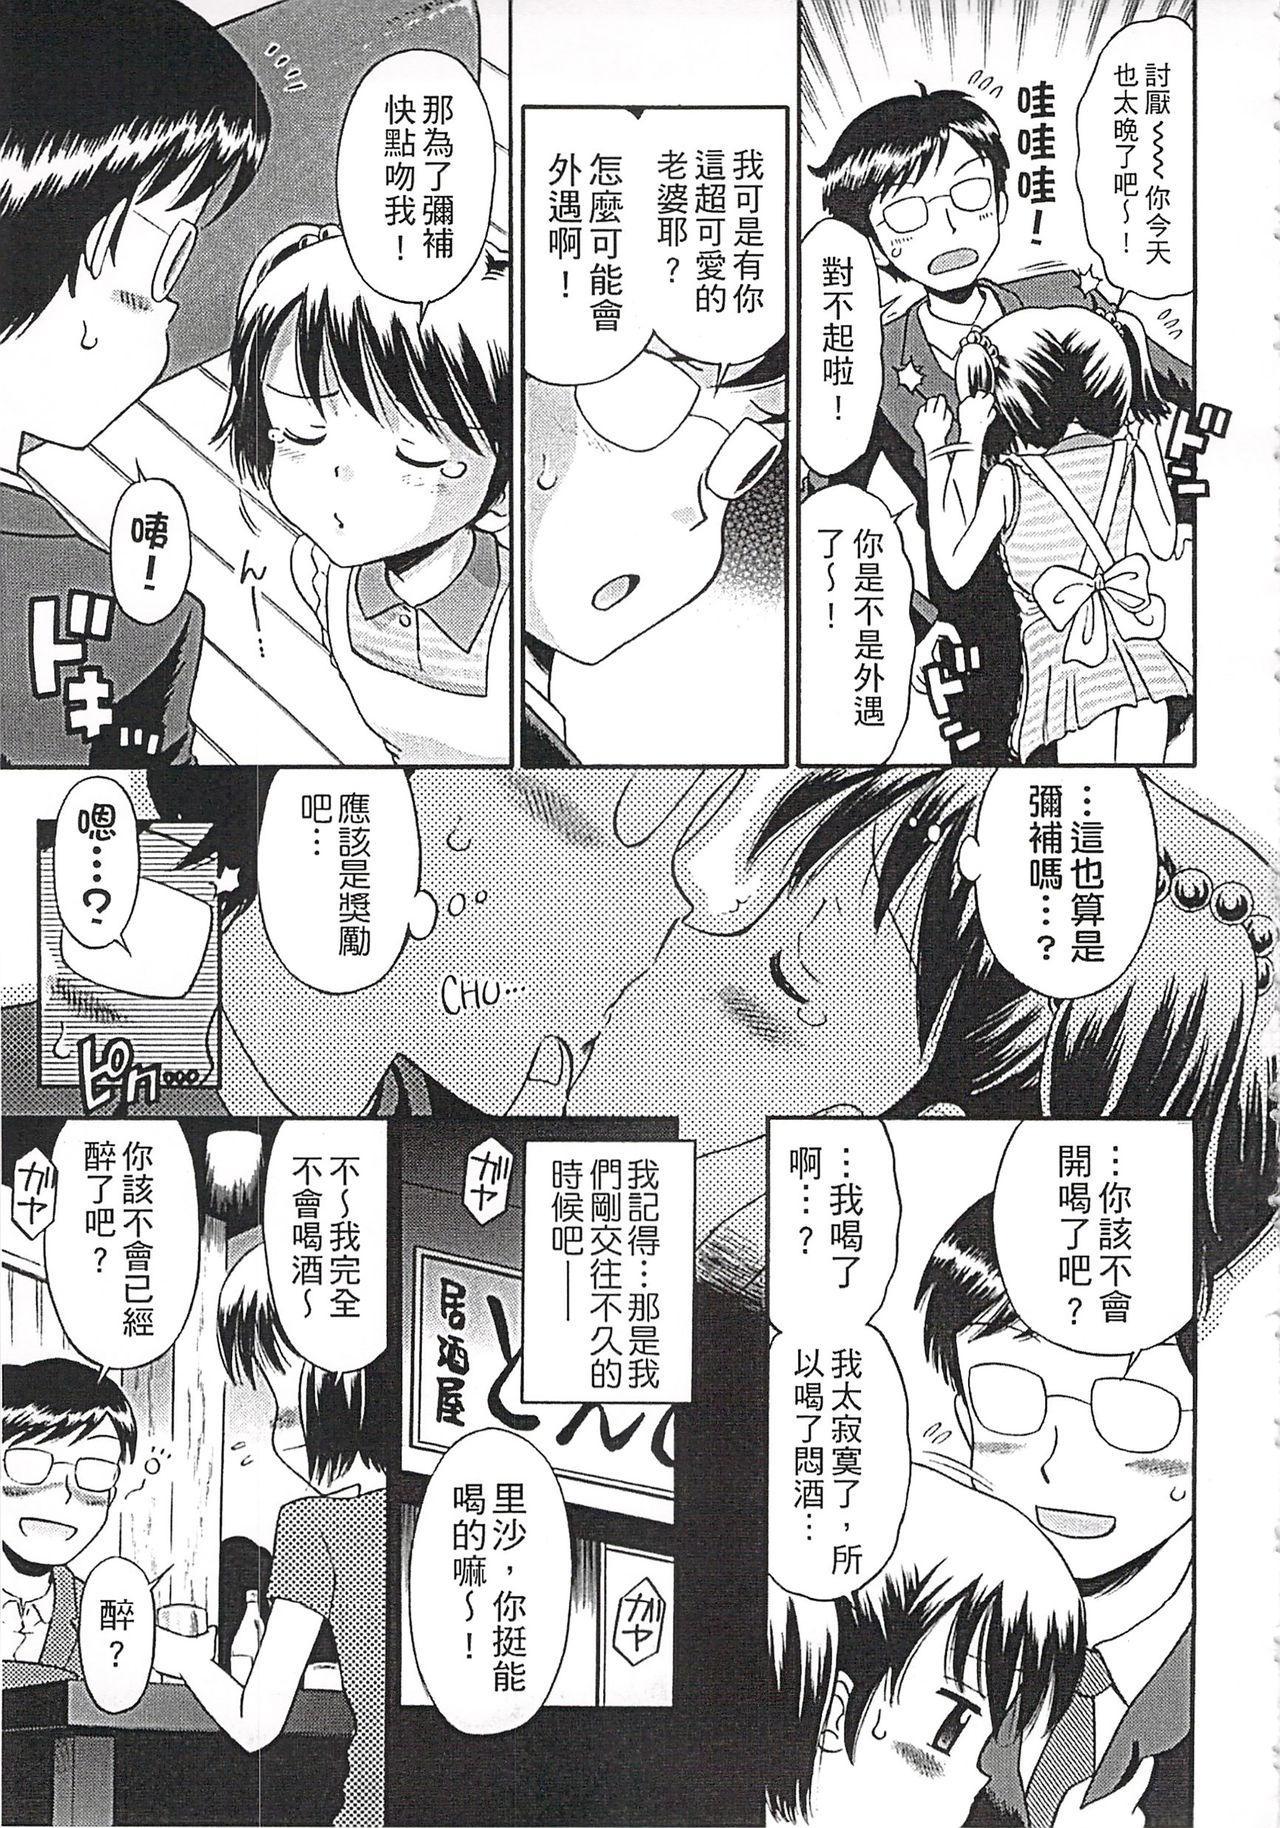 Kore demo Otona Desu Kedo!? Mrs.LOLITA Kanzenban   人家是大人啦! ~Mrs.LOLITA完全版 30